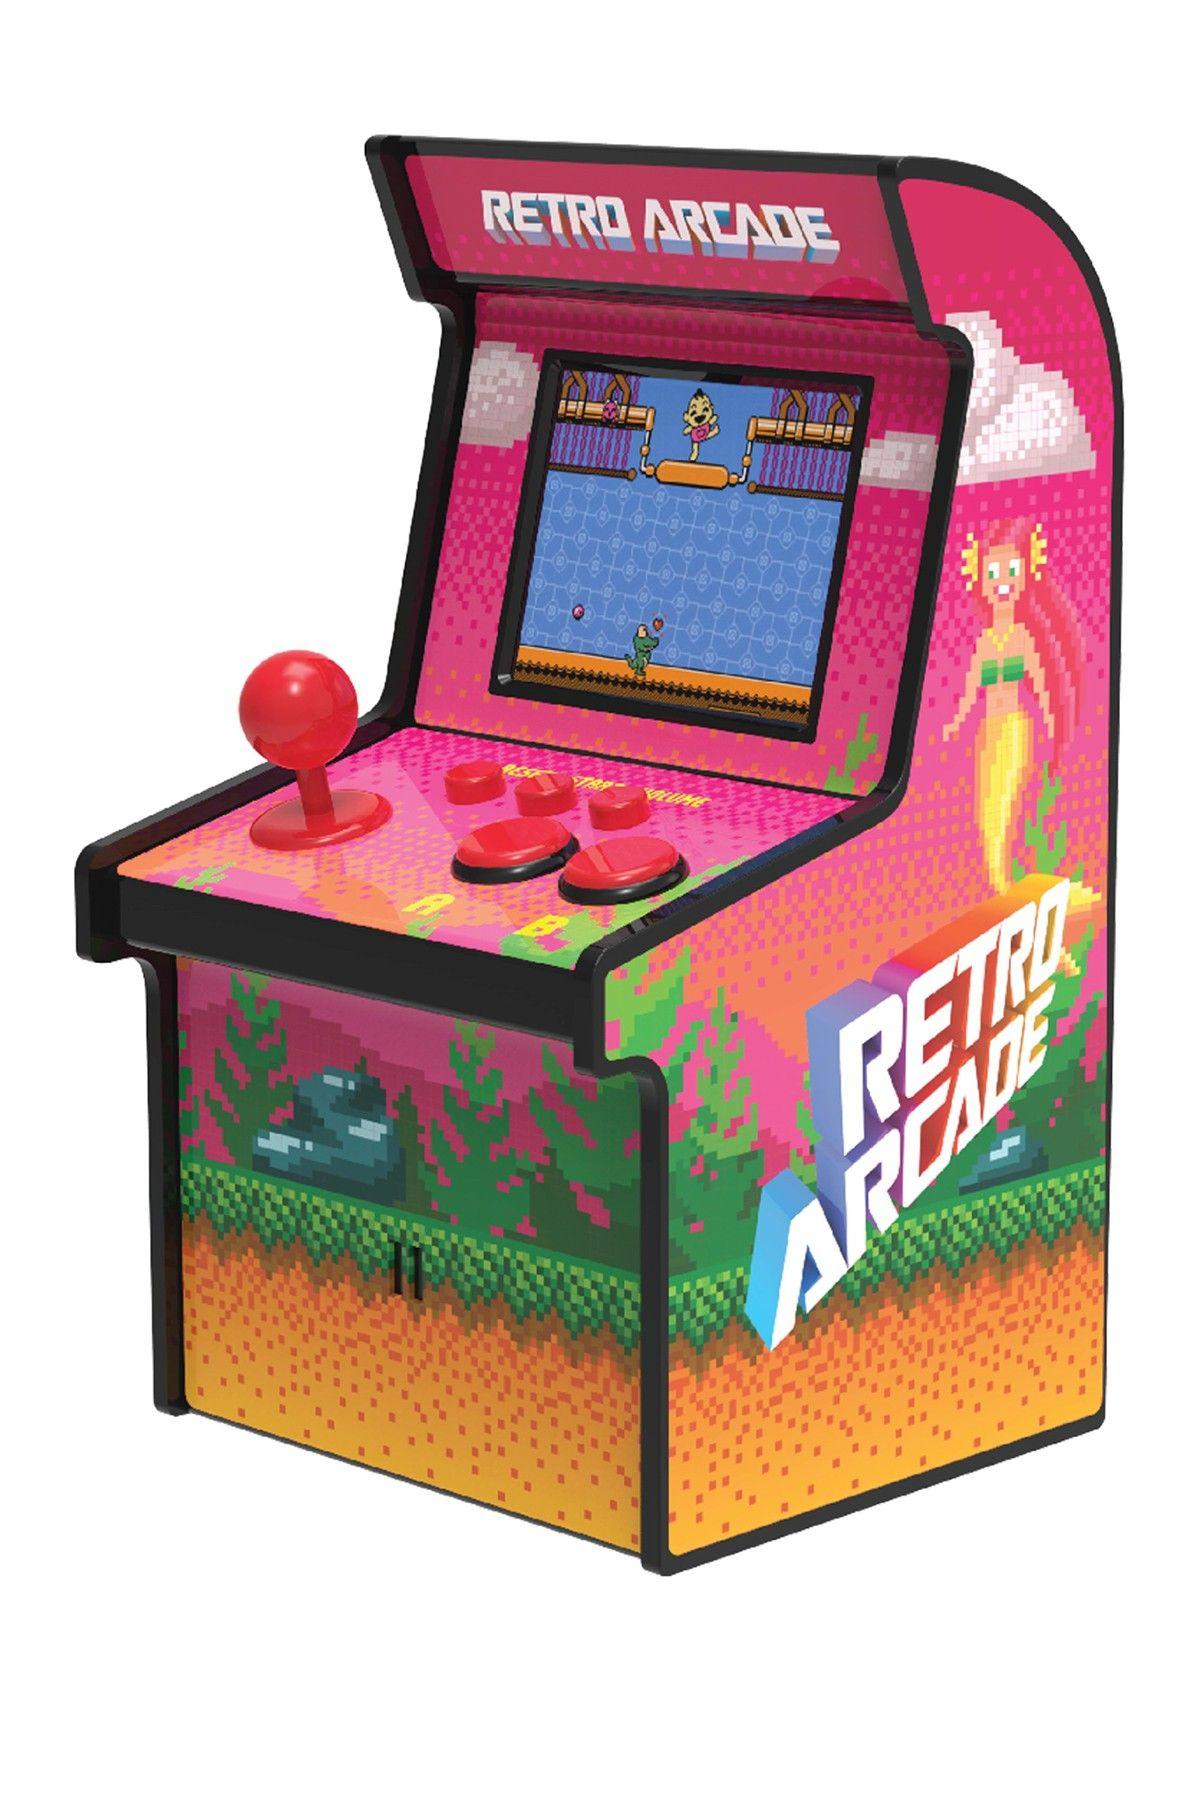 VIBRANT Mini Arcade Game Arcade games, Mini arcade, Arcade